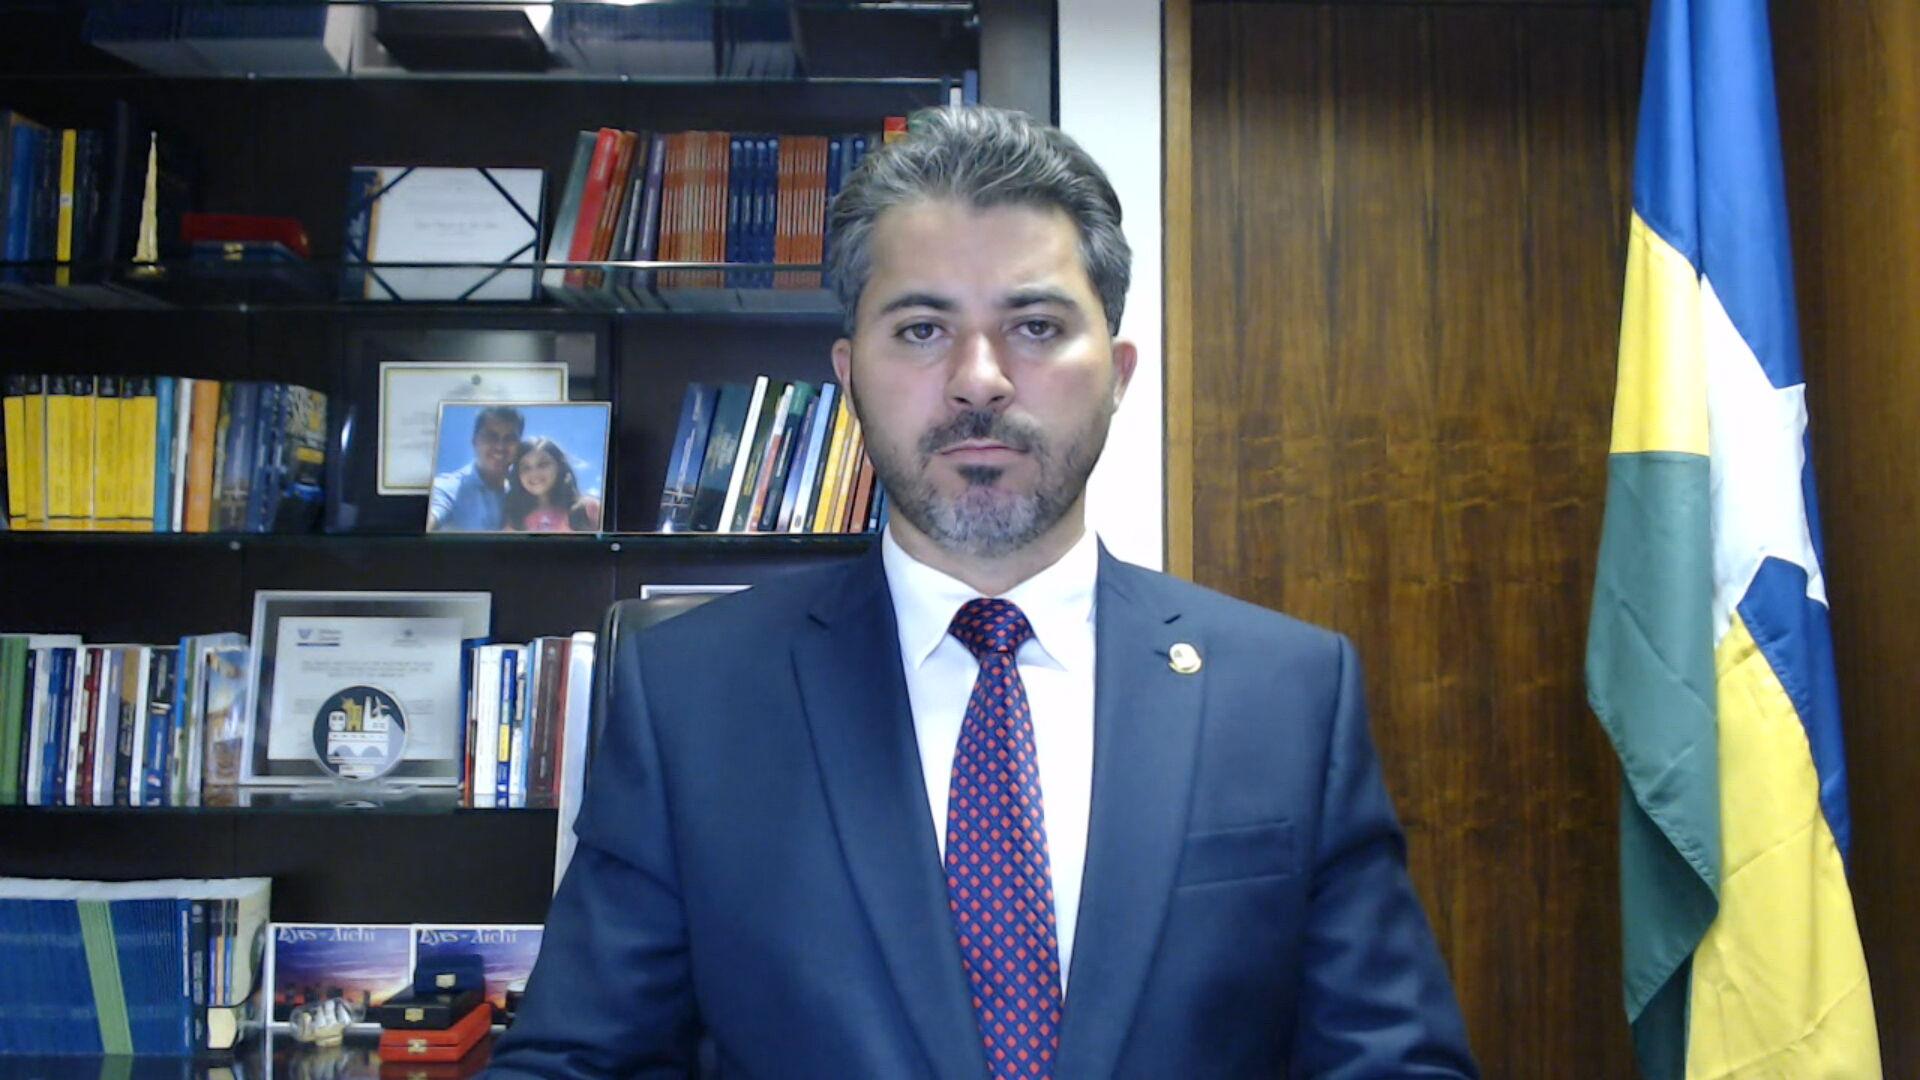 O senador Marcos Rogério falou com a CNN sobre o depoimento de Wajngarten